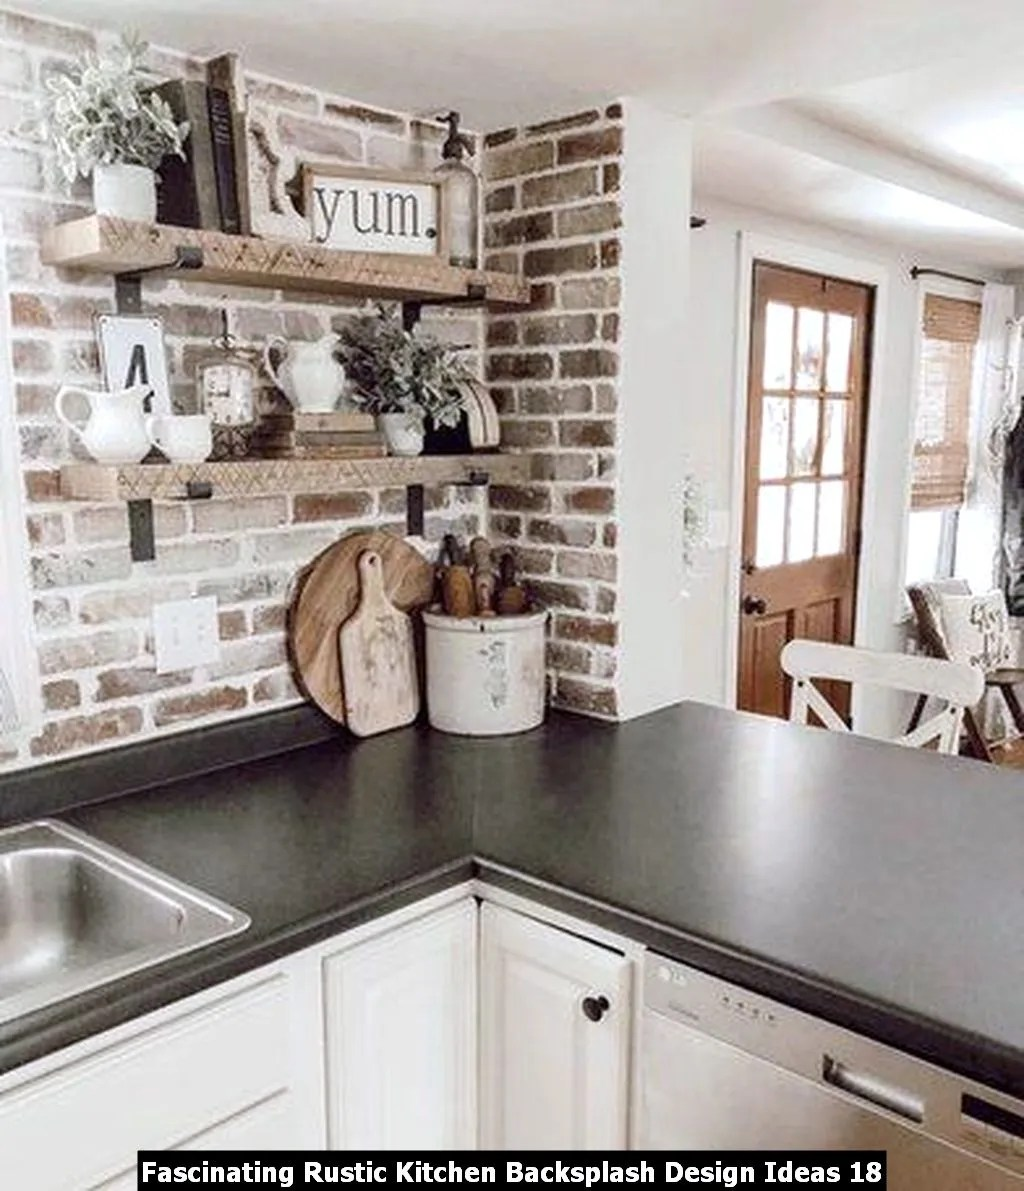 Fascinating Rustic Kitchen Backsplash Design Ideas 18